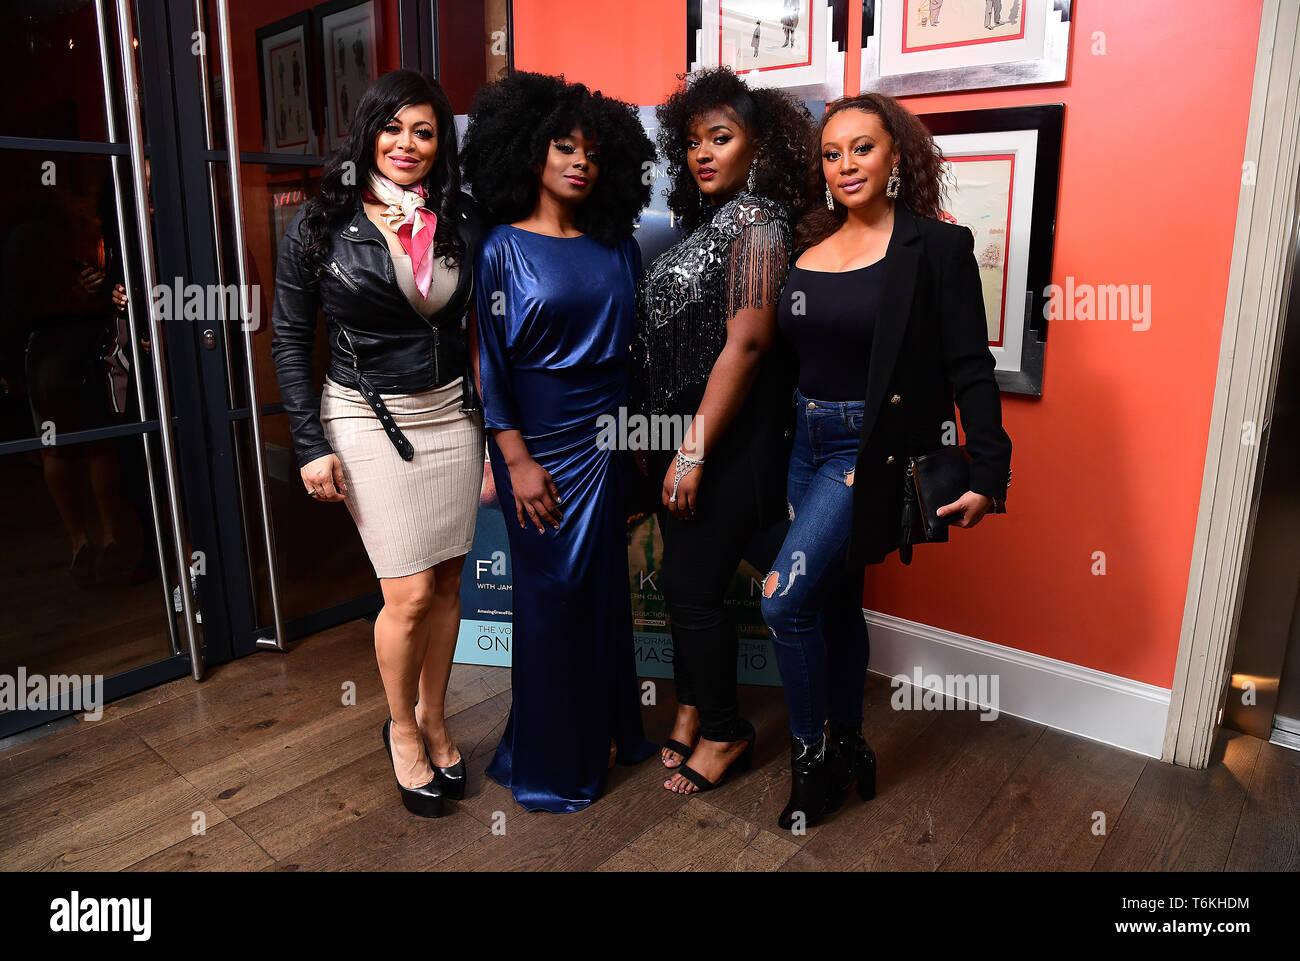 Stacy Francis, Cleopatra Higgins, Cleo Stewart y Tanya Edwards asistieron a la proyección del documental, Aretha Franklin Amazing Grace, a jamón Yard Hotel, Londres. Foto de stock